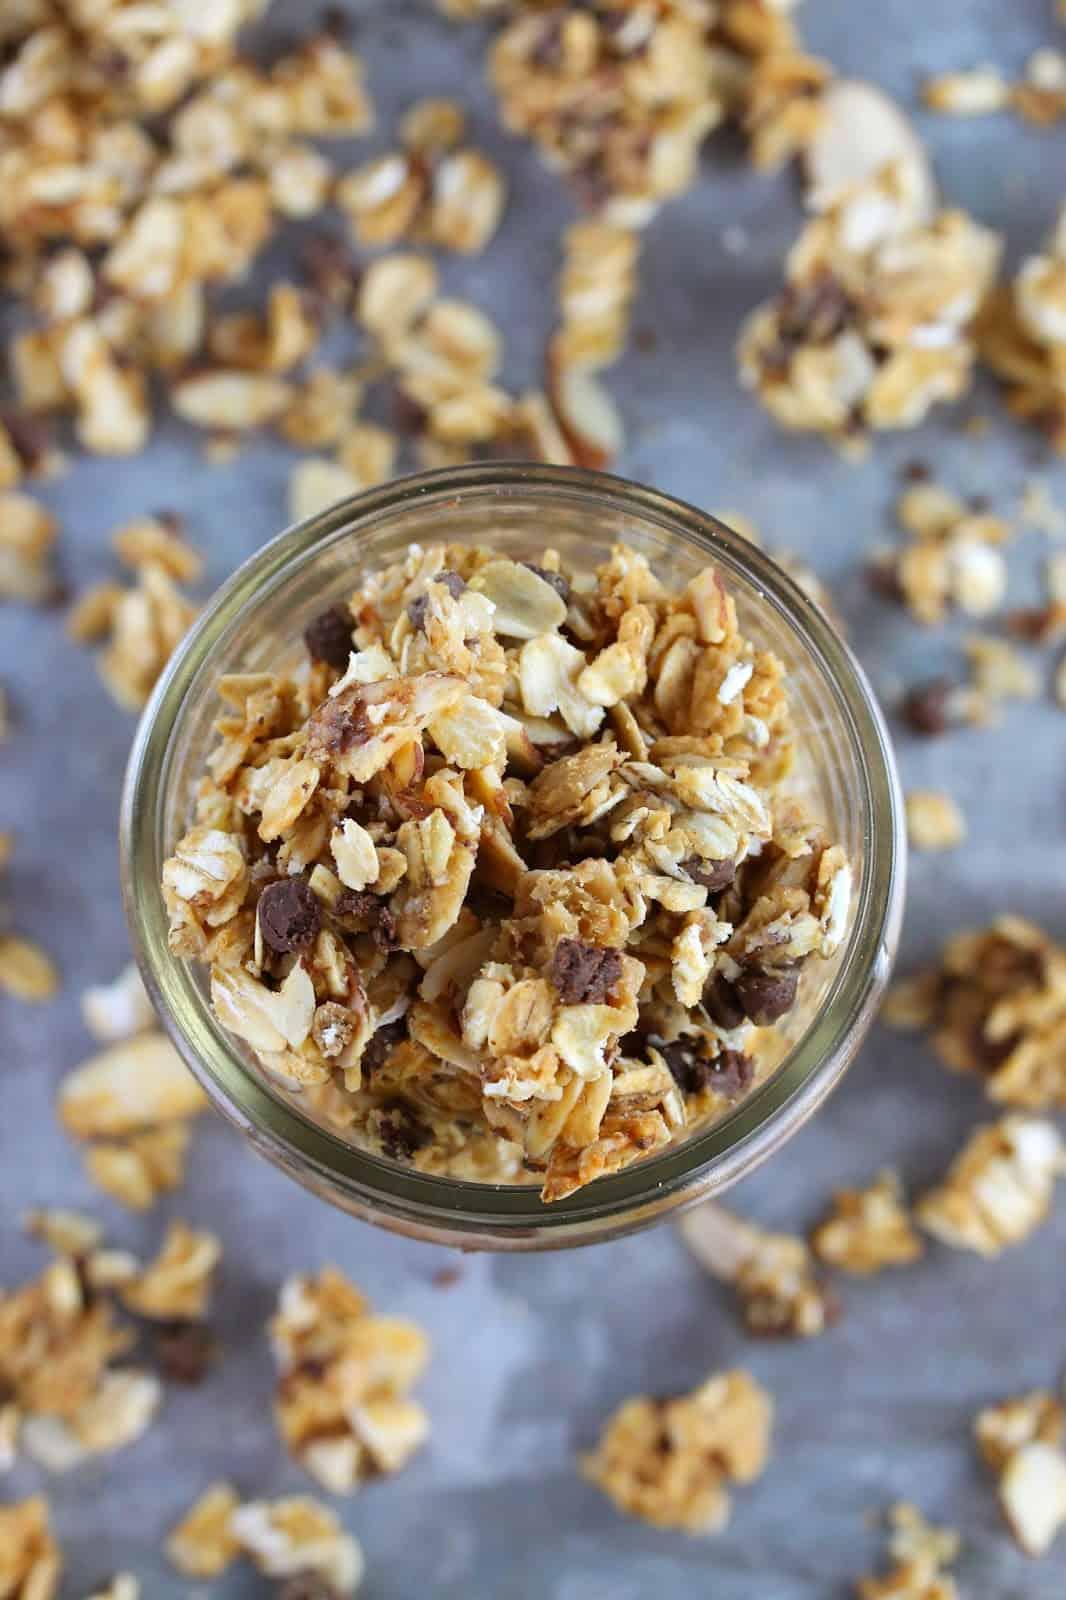 Bird's eye view of Honey Nut Granola in a mason jar.